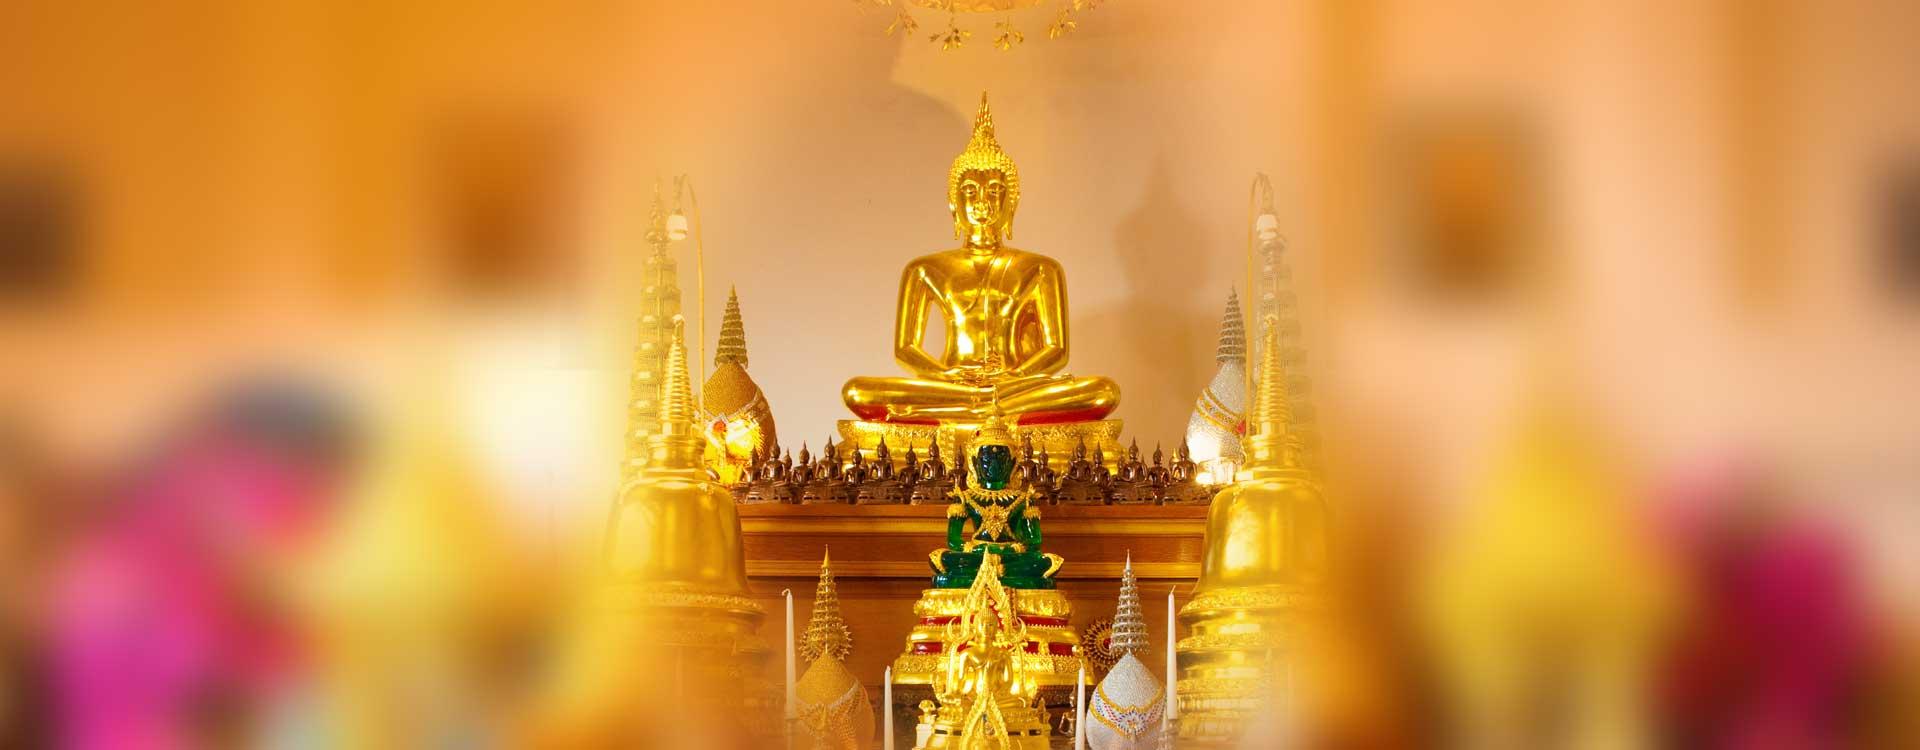 Wat Thai Washington, D.C.